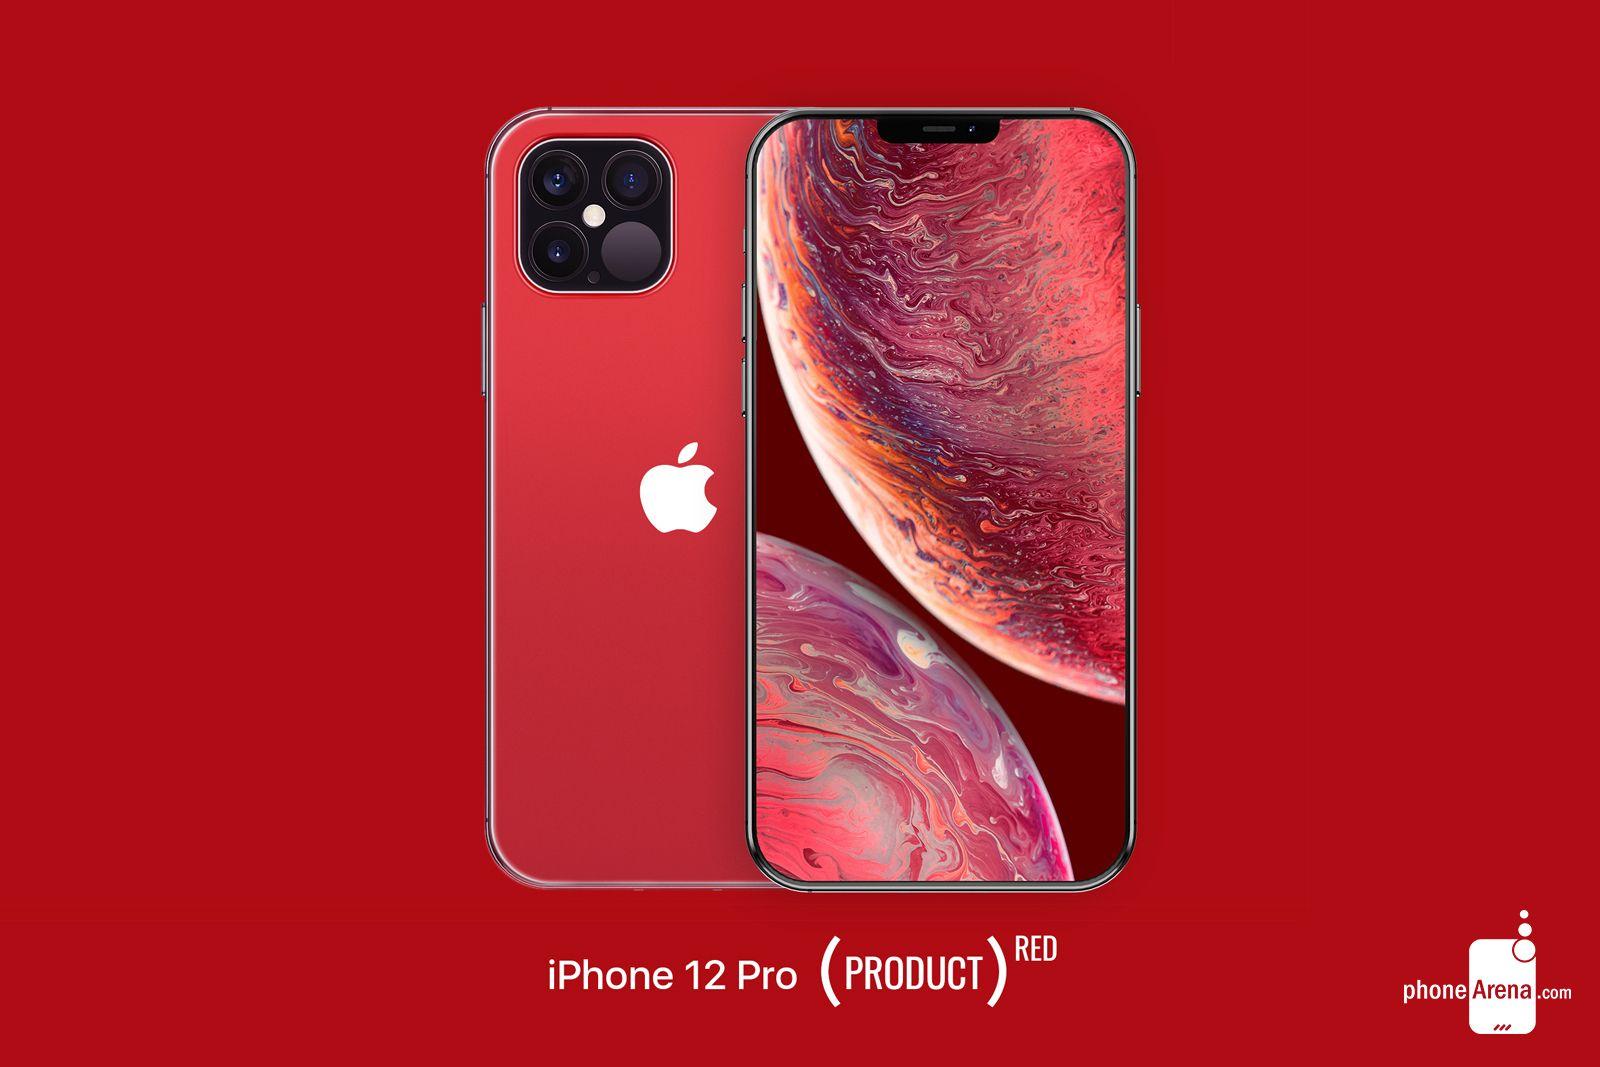 Iphone 12 Pro Iphone New Iphone Apple Iphone